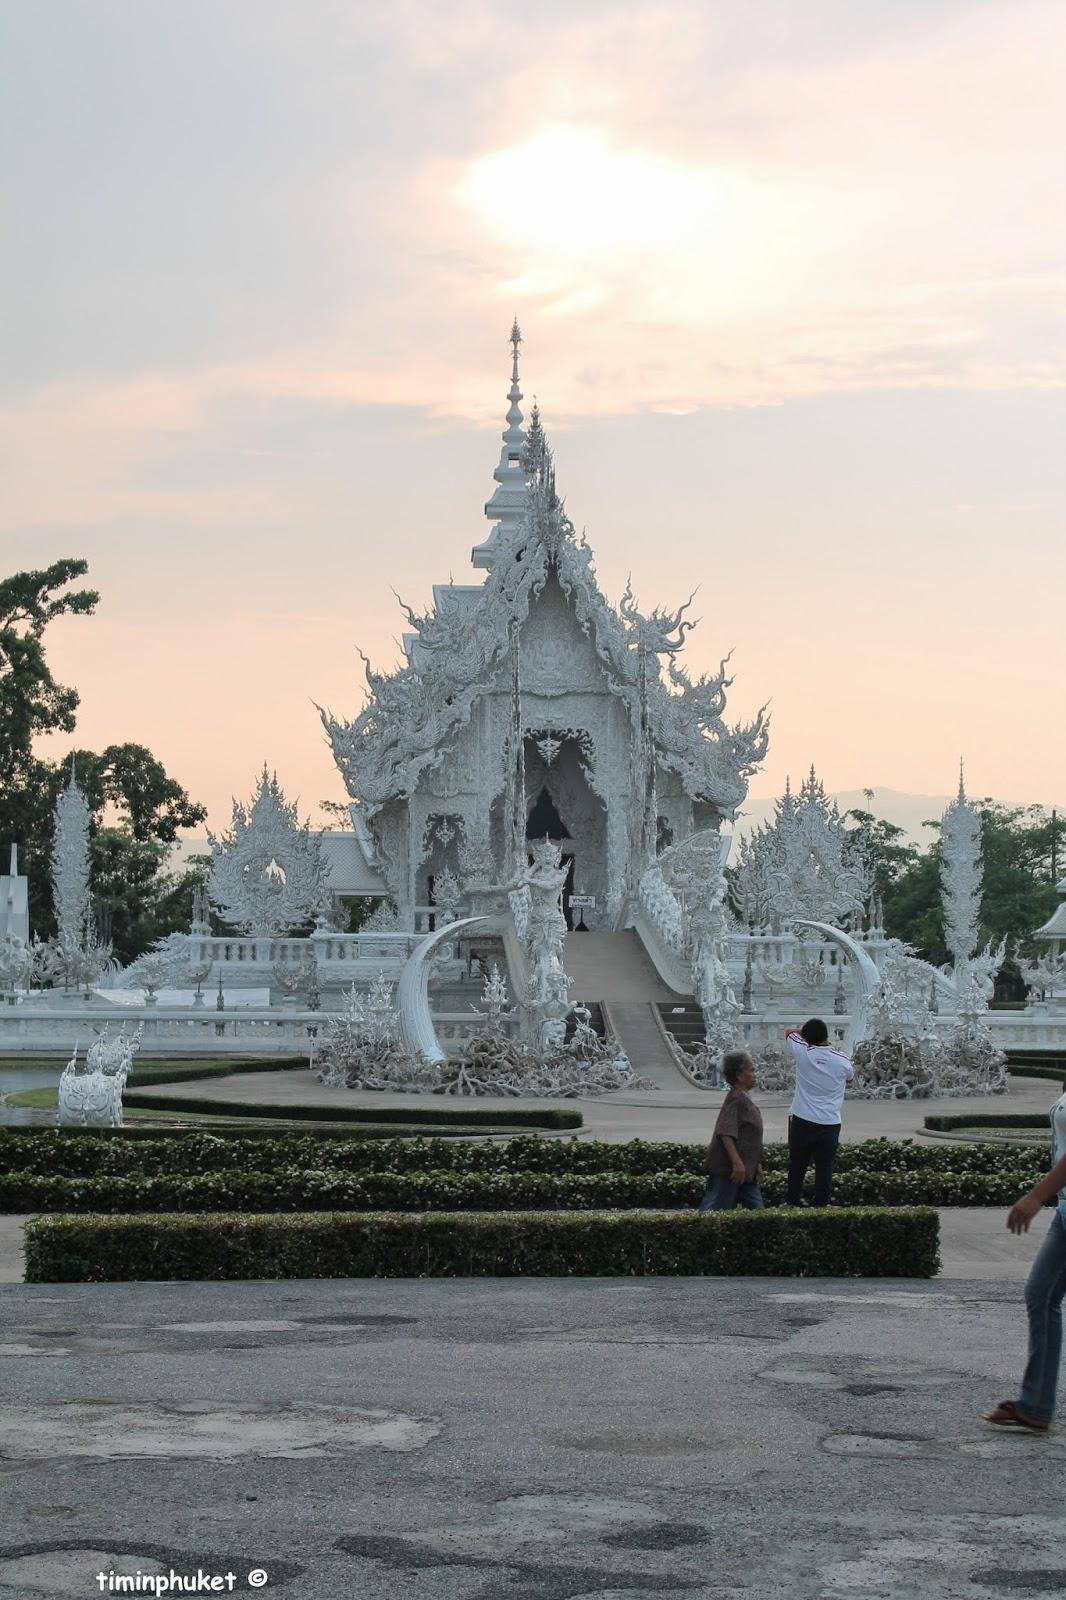 tim in phuket: Wat Rong Khun (วัดร่องขุ่น) - Chiang Rai